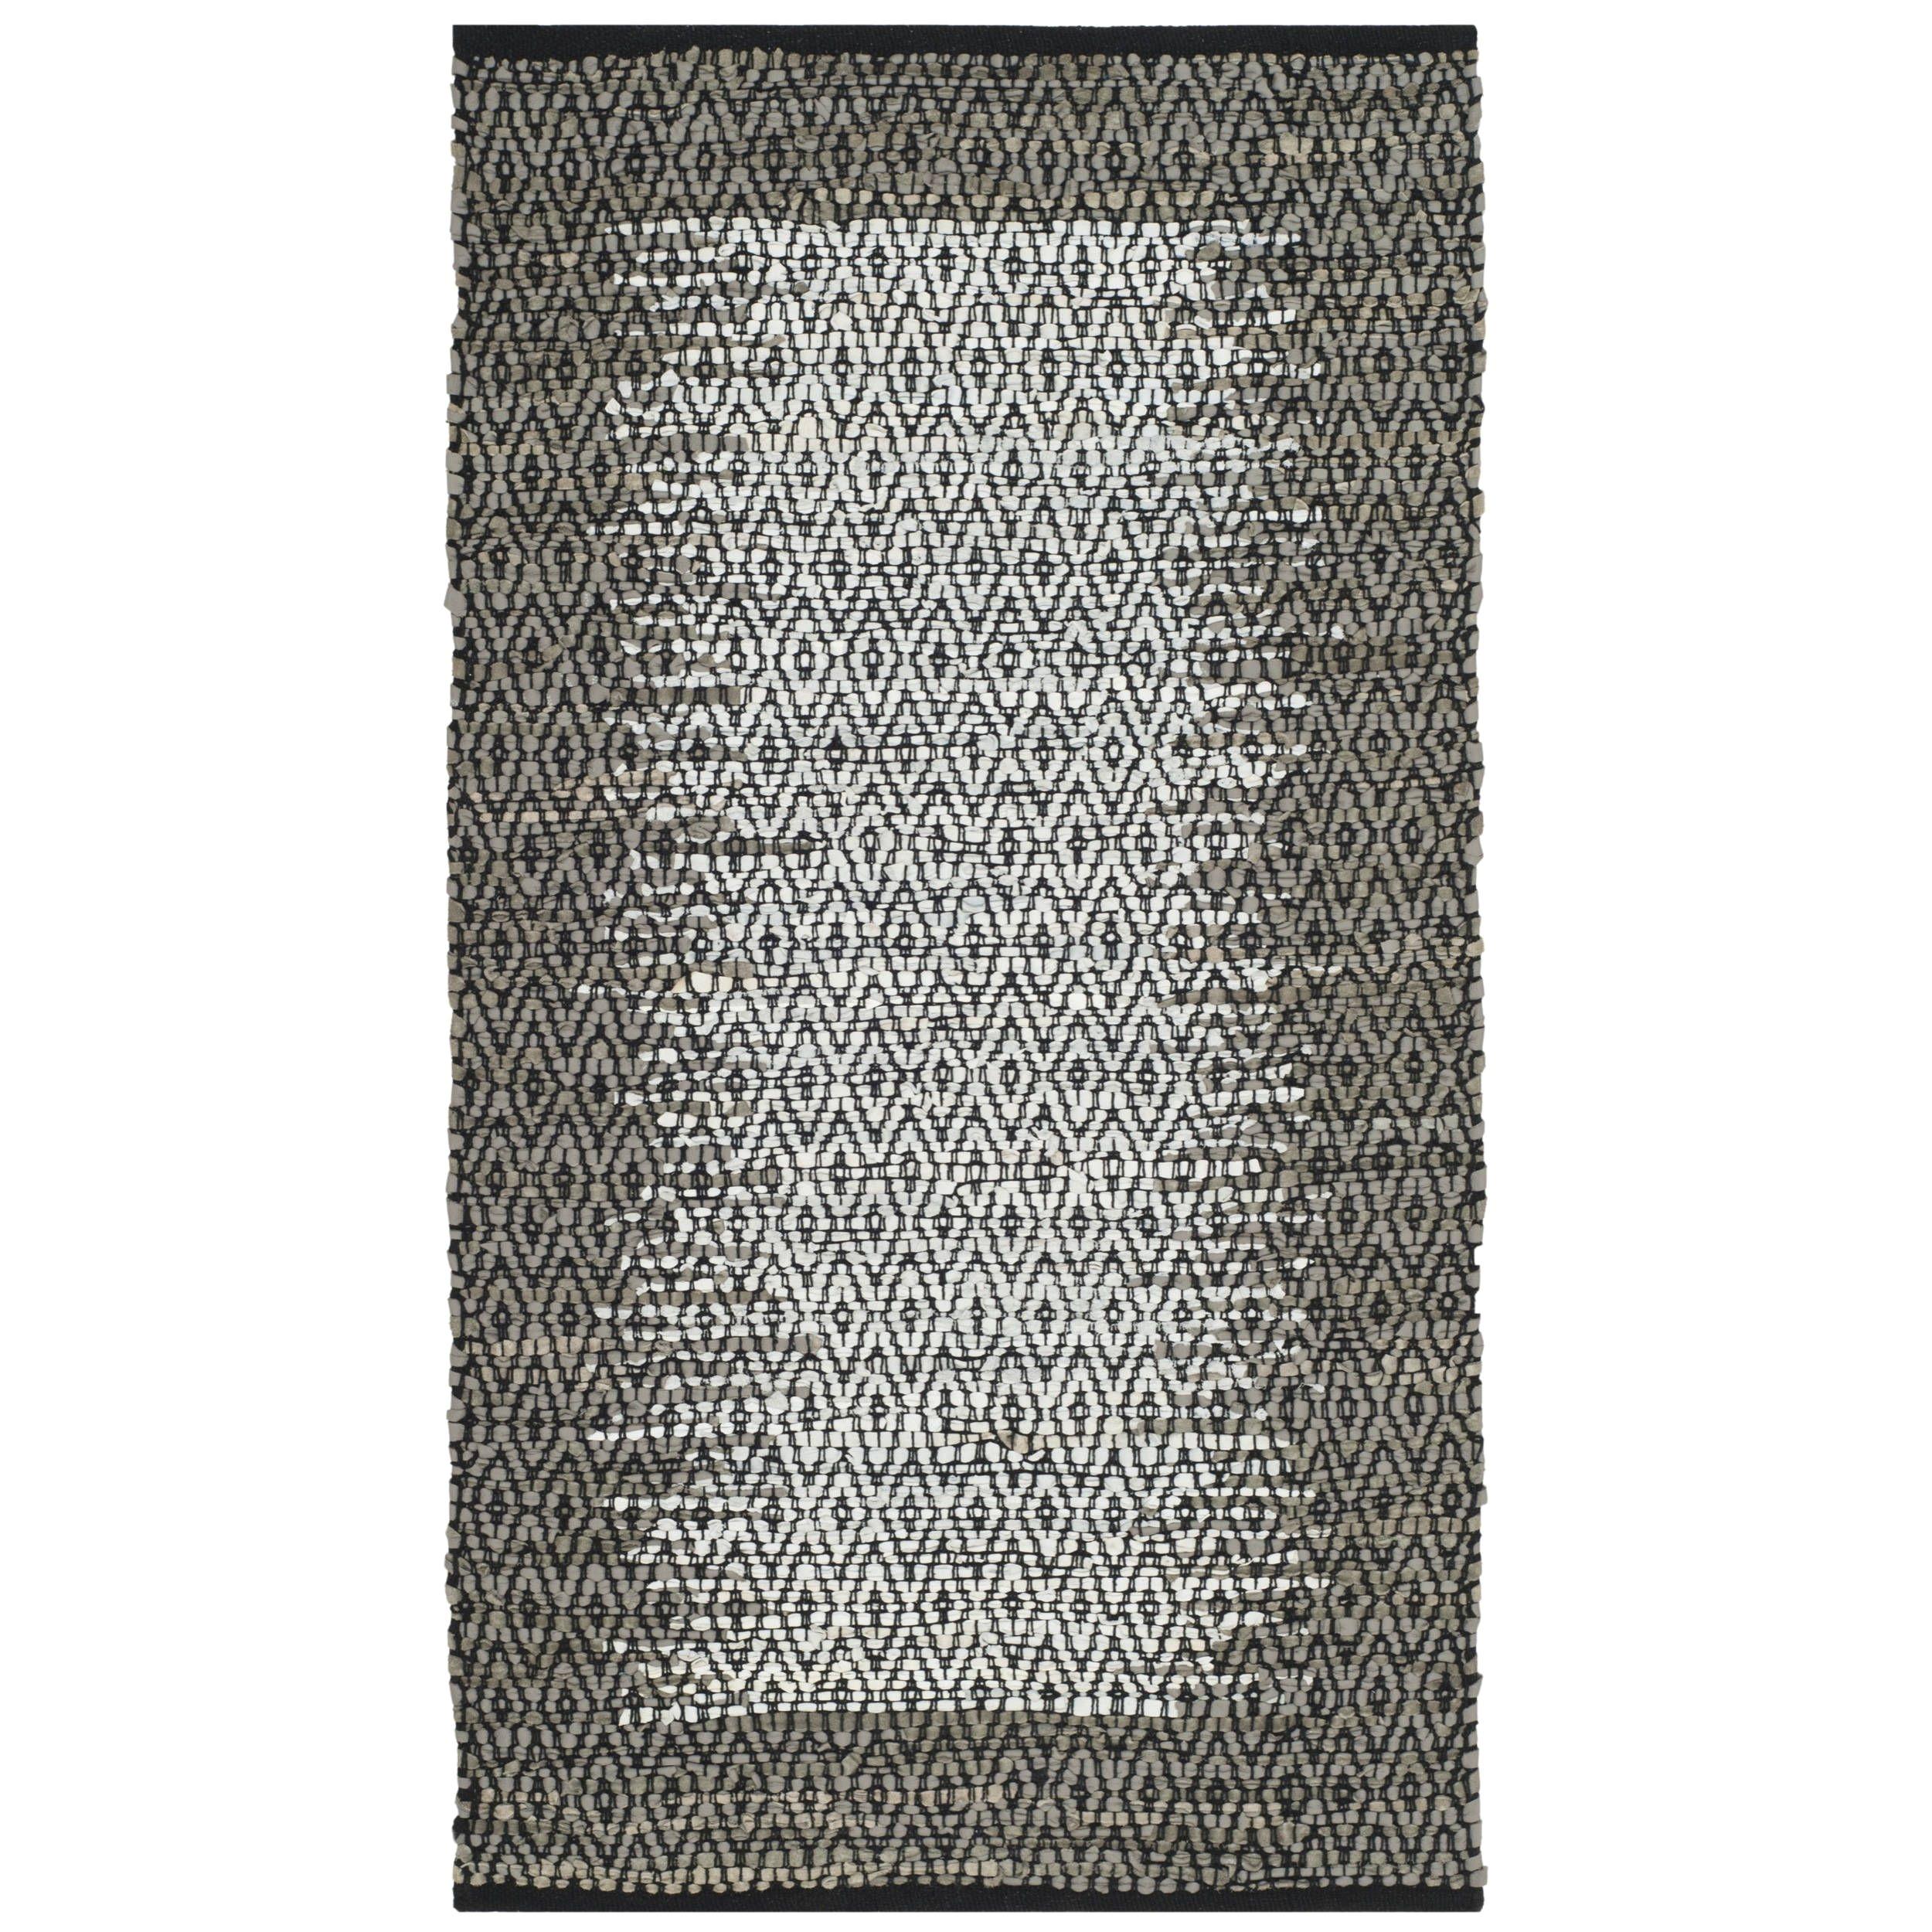 safavieh vintage leather handwoven modern geometric light grey grey area rug 2 3 x 4 vtl387a 24 size 2 x 4